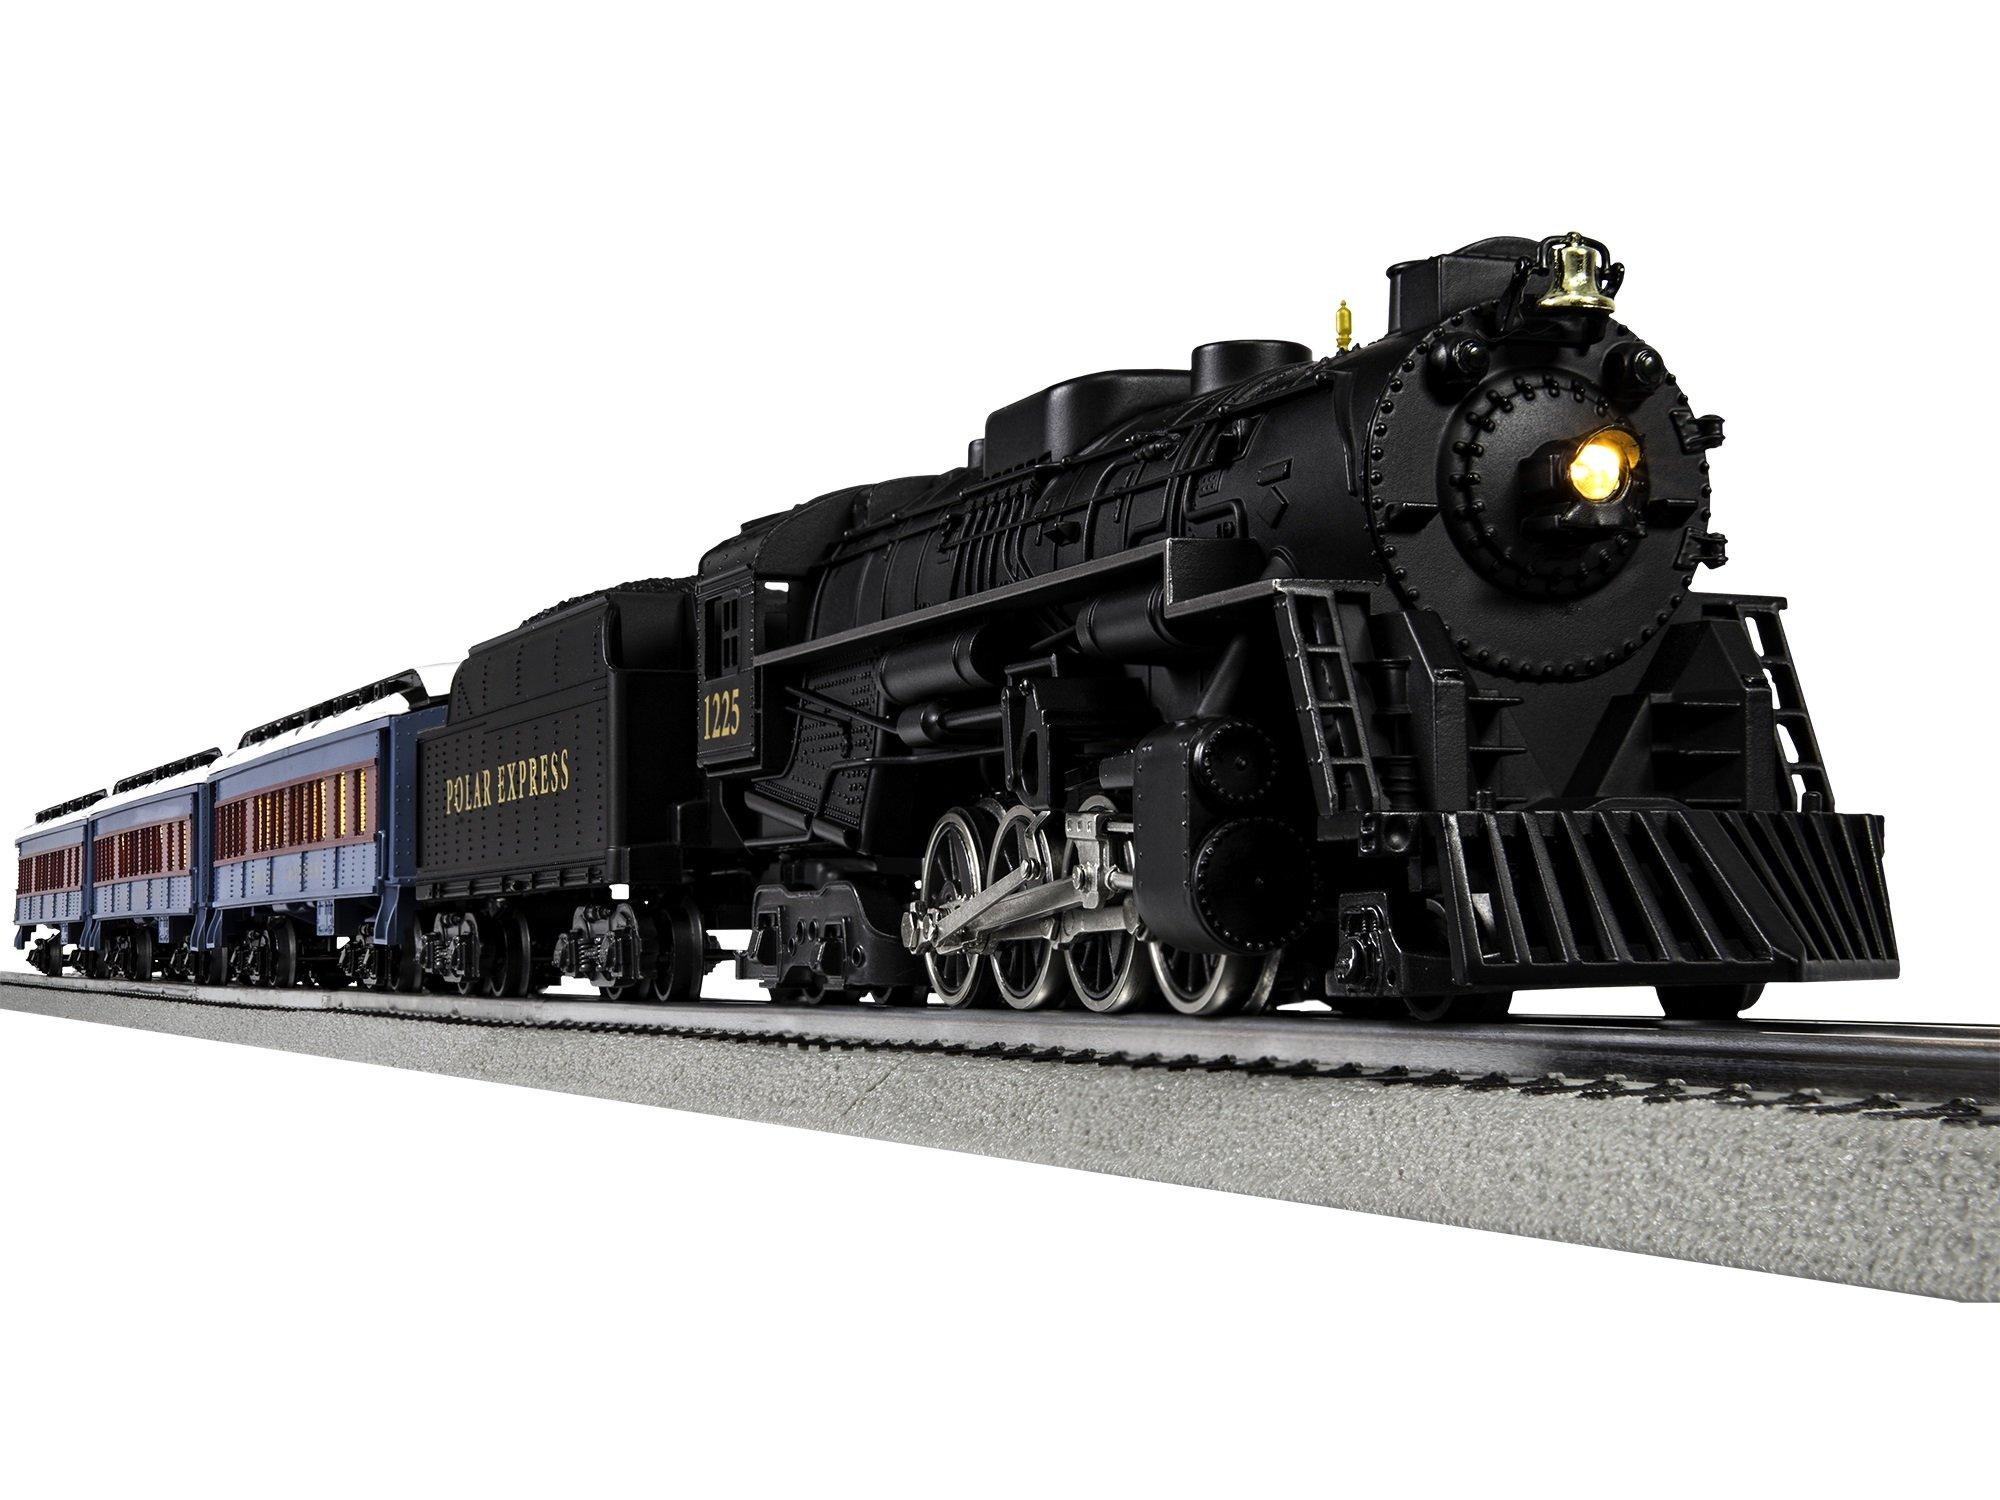 Lionel The Polar Express LionChief Train Set with Bluetooth Train Set by Lionel (Image #2)